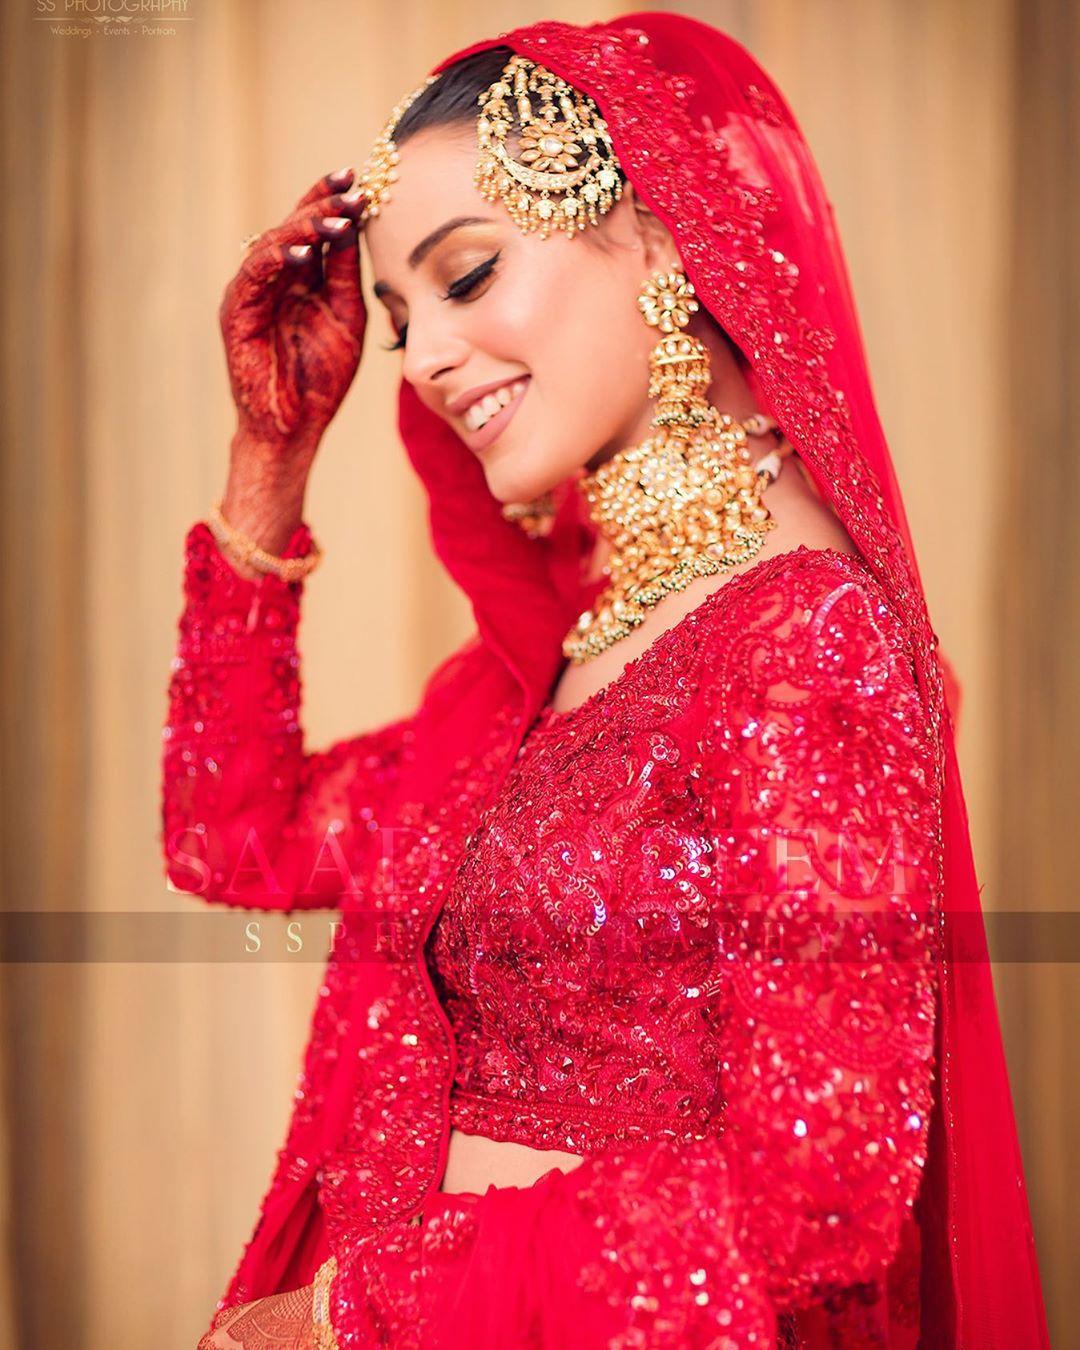 Iqra Aziz and Yasir Hussain Wedding Pictures (14)